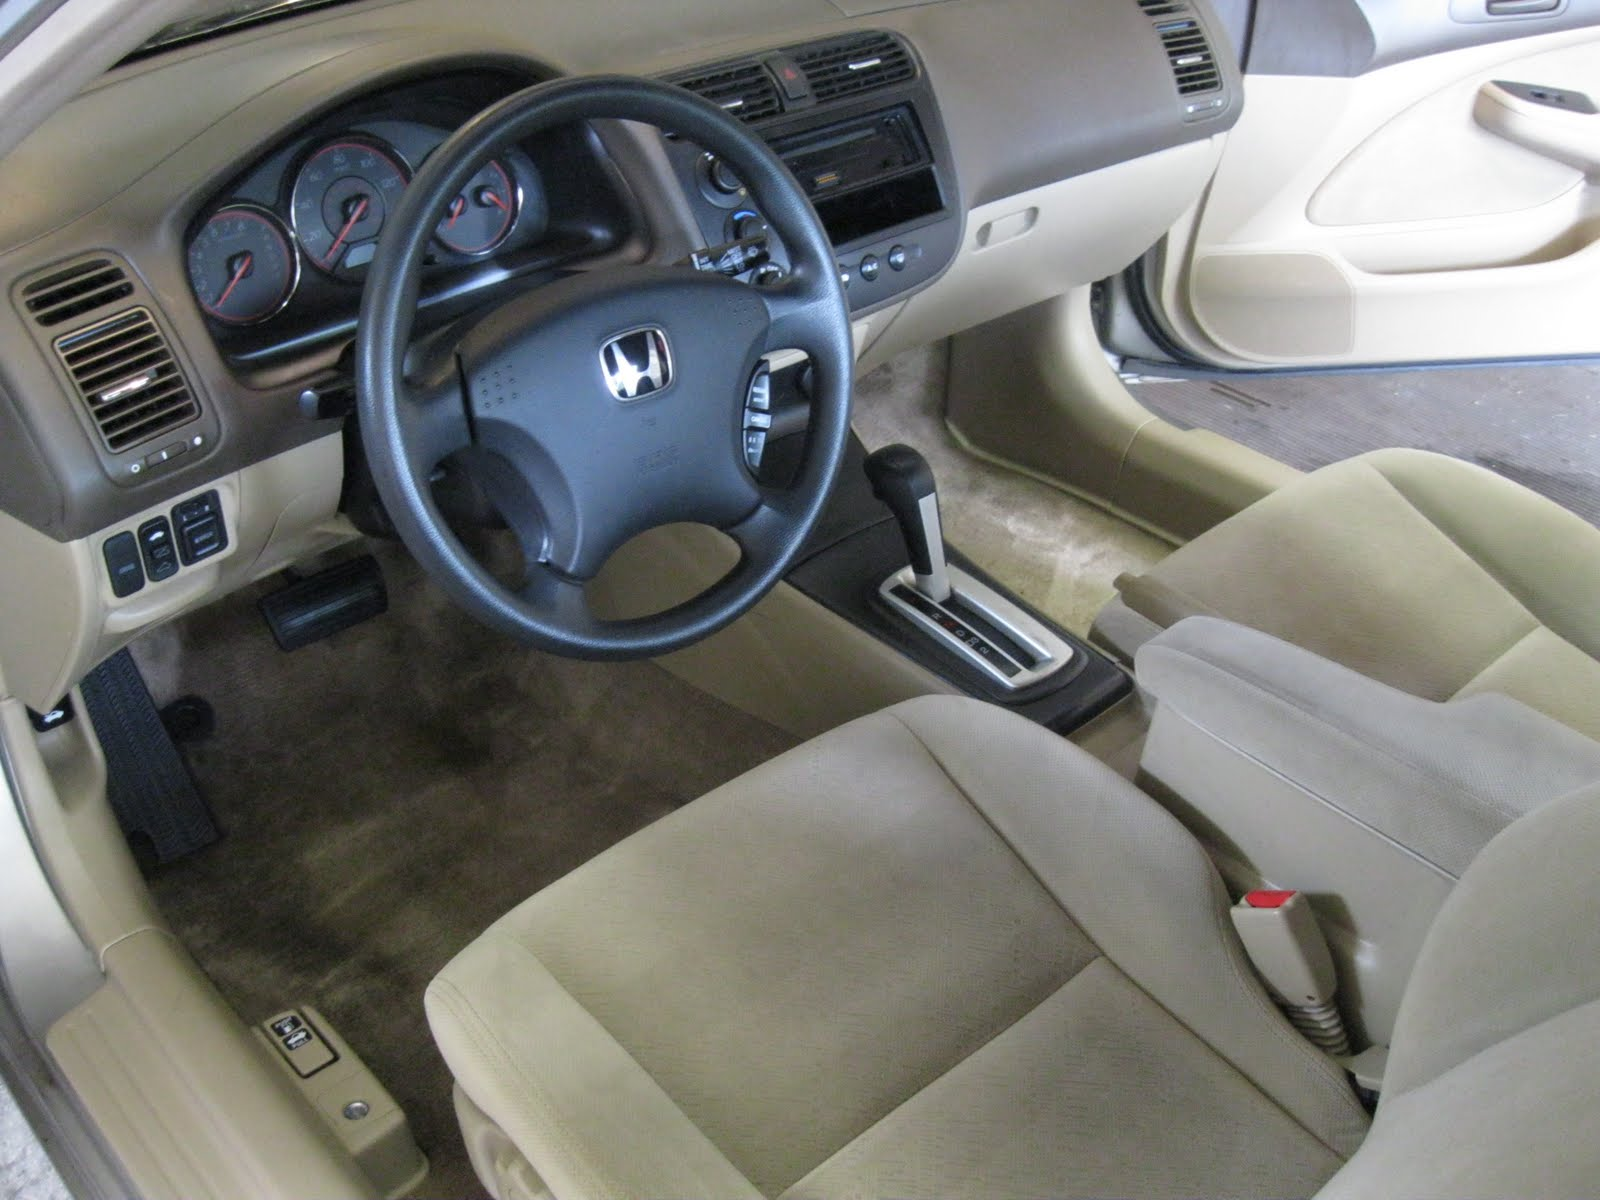 Ben S Detailing 2003 Honda Civic Coupe Interior Detail